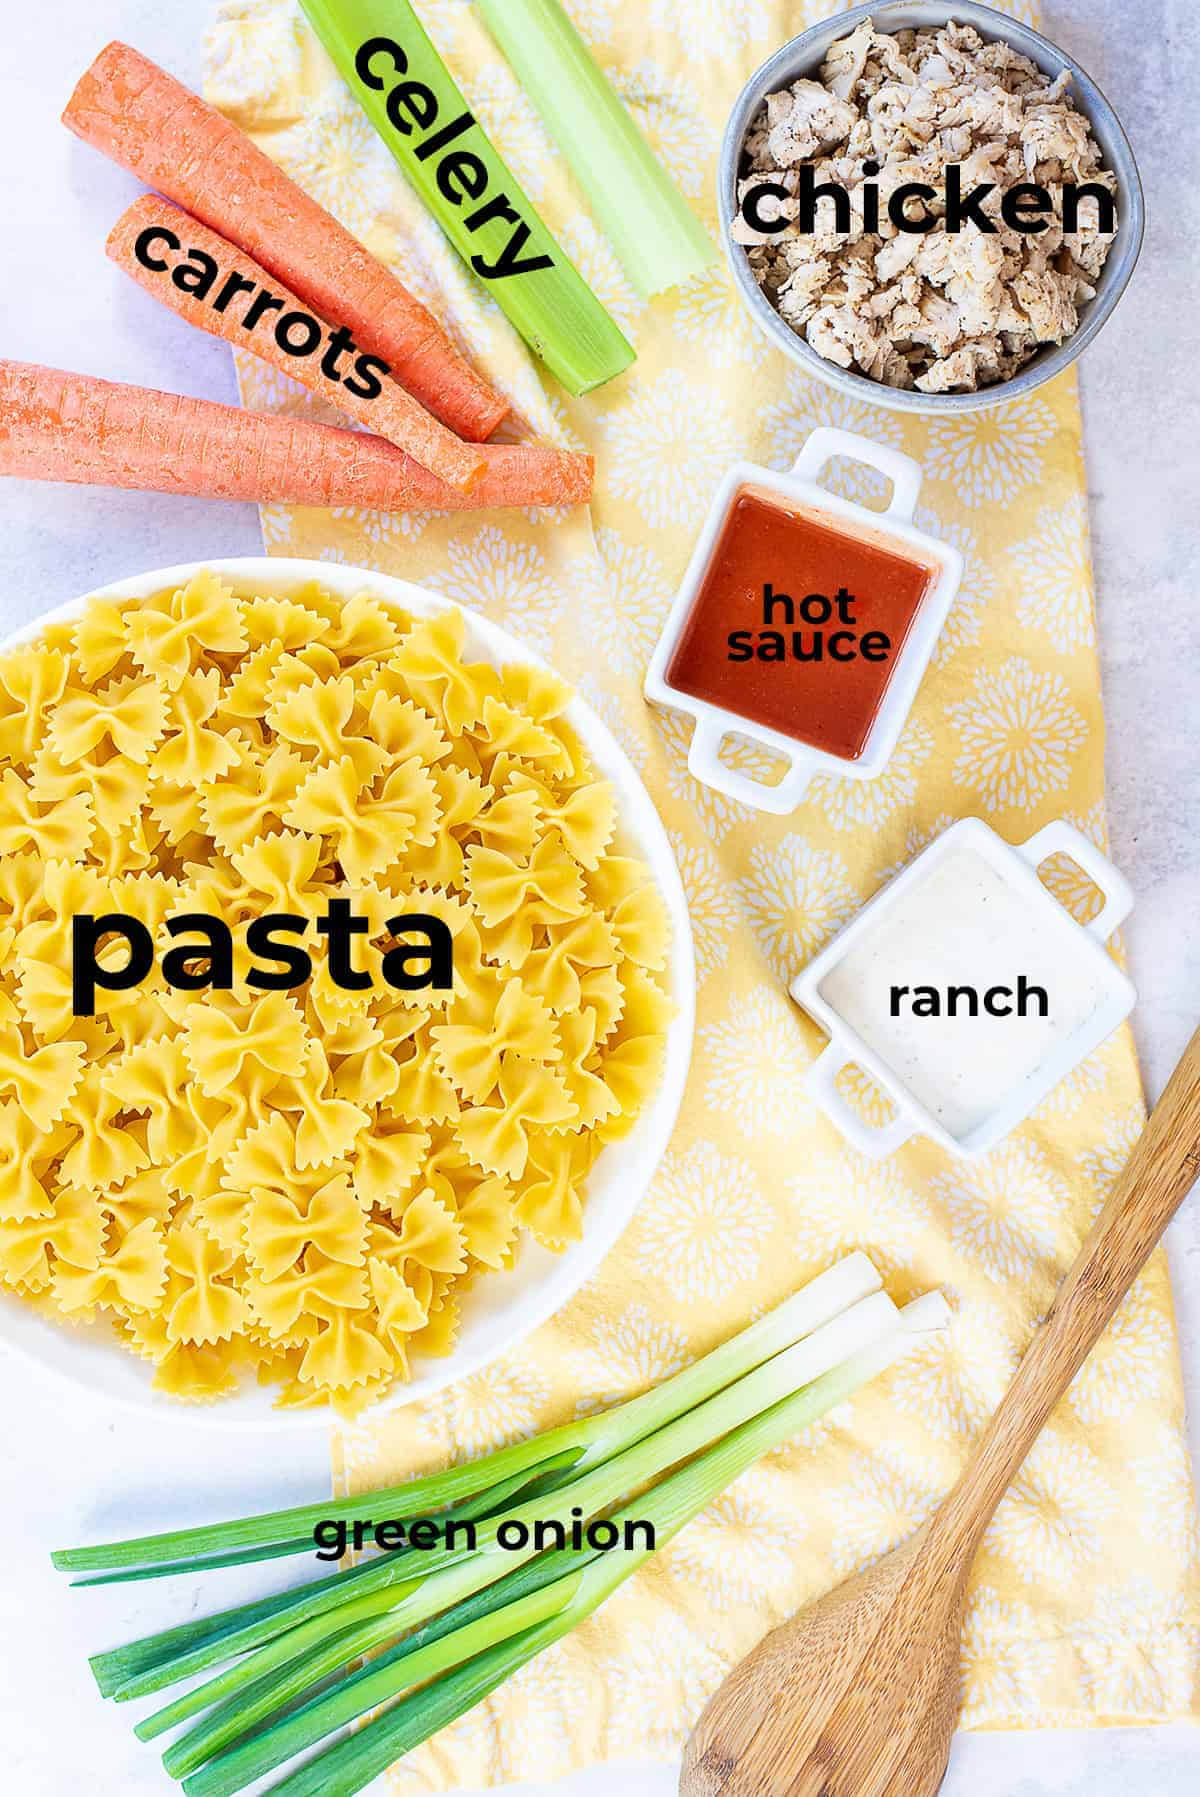 ingredients for buffalo chicken pasta salad.